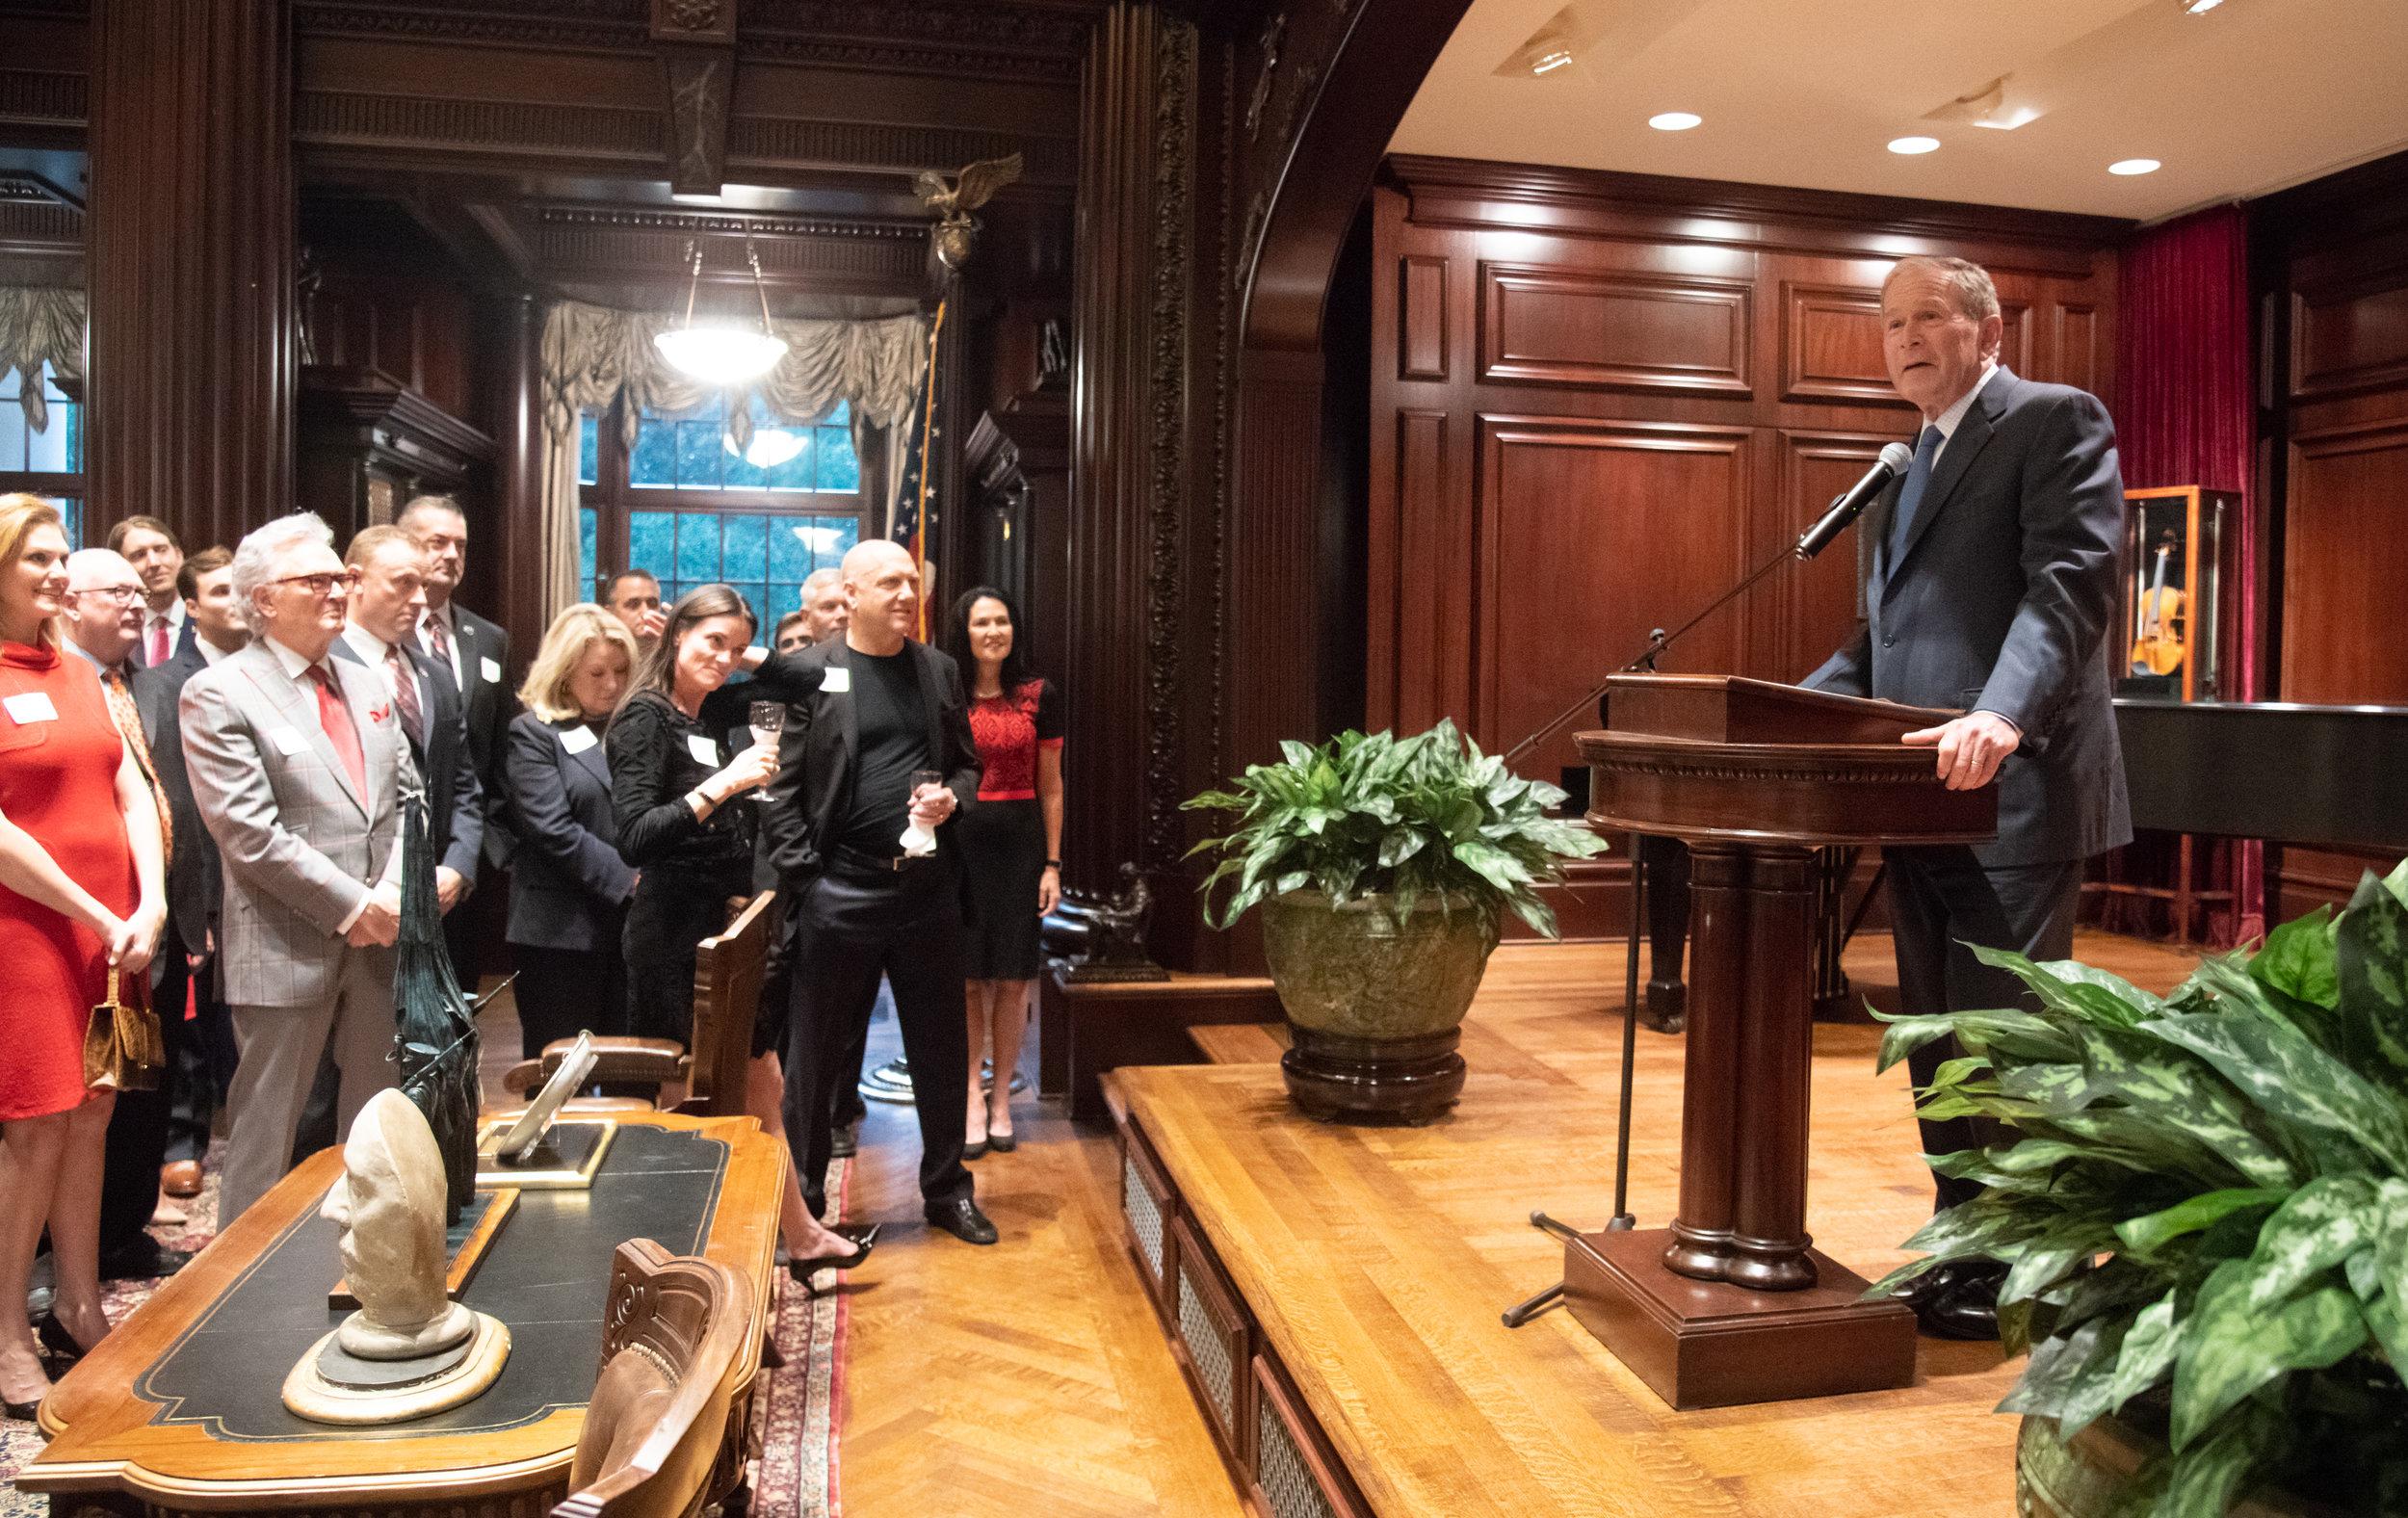 Former President George W. Bush speaks at Harlan Crow's Library on September 20, 2018.